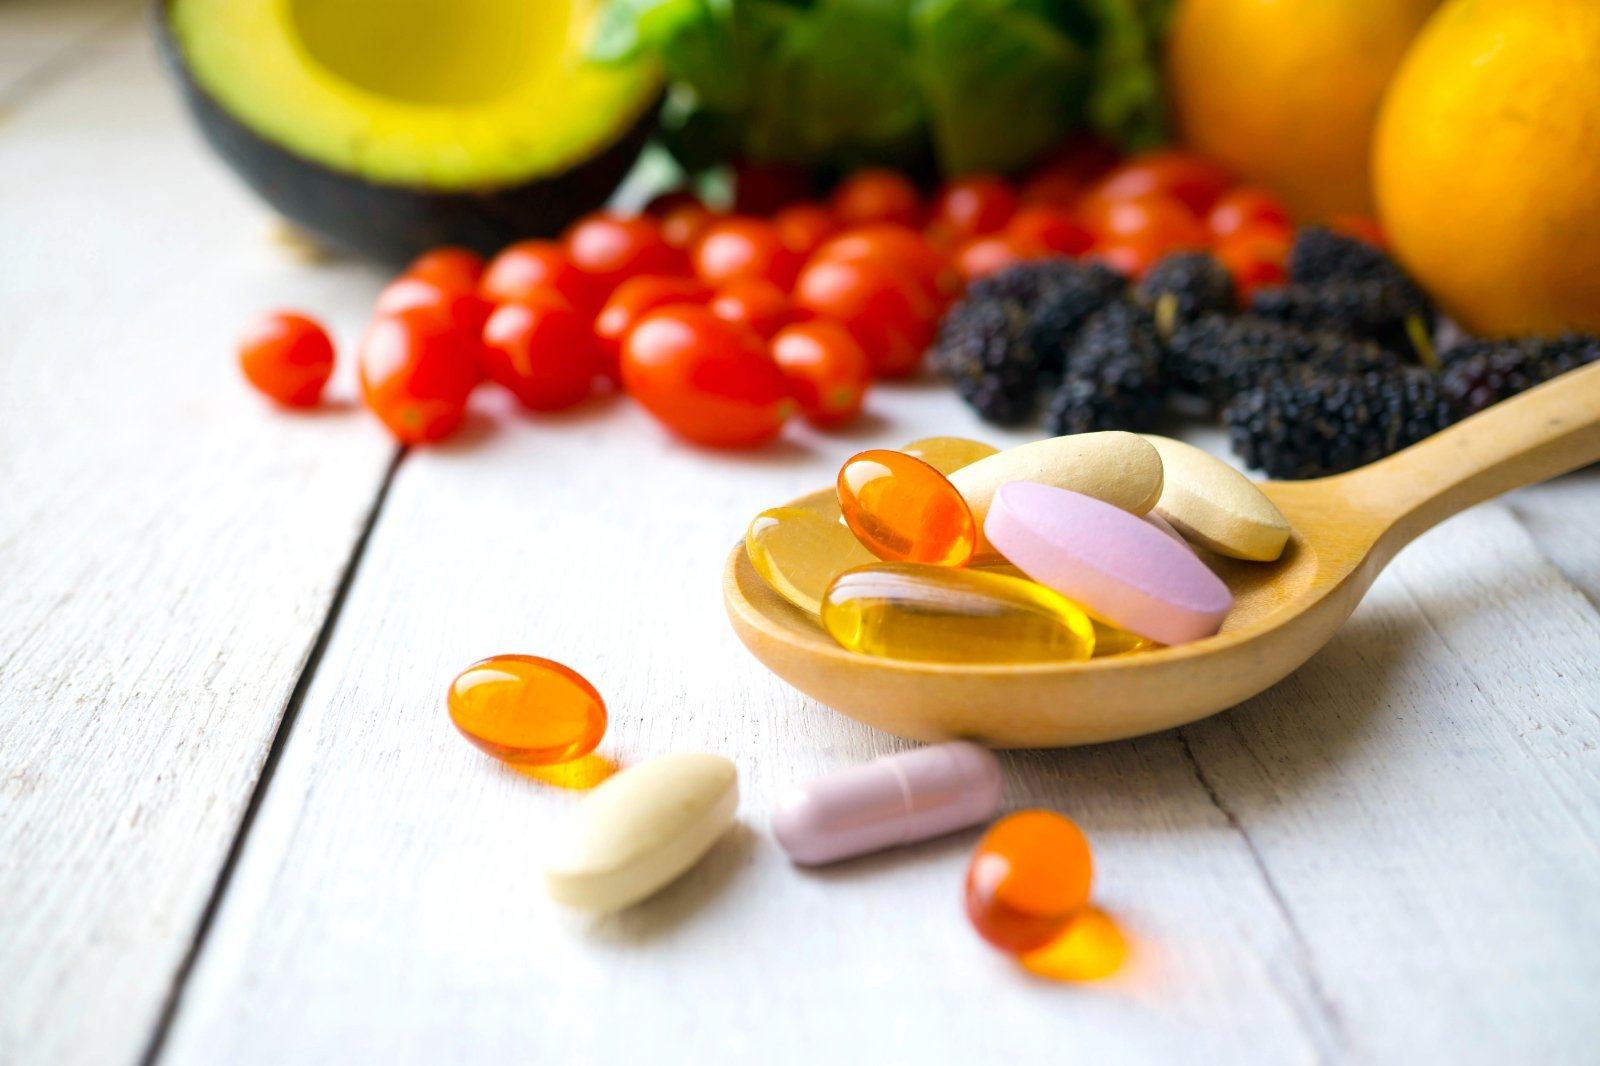 šventas širdies sveikatos dietos receptas širdies sveikatos omega 3 papildas